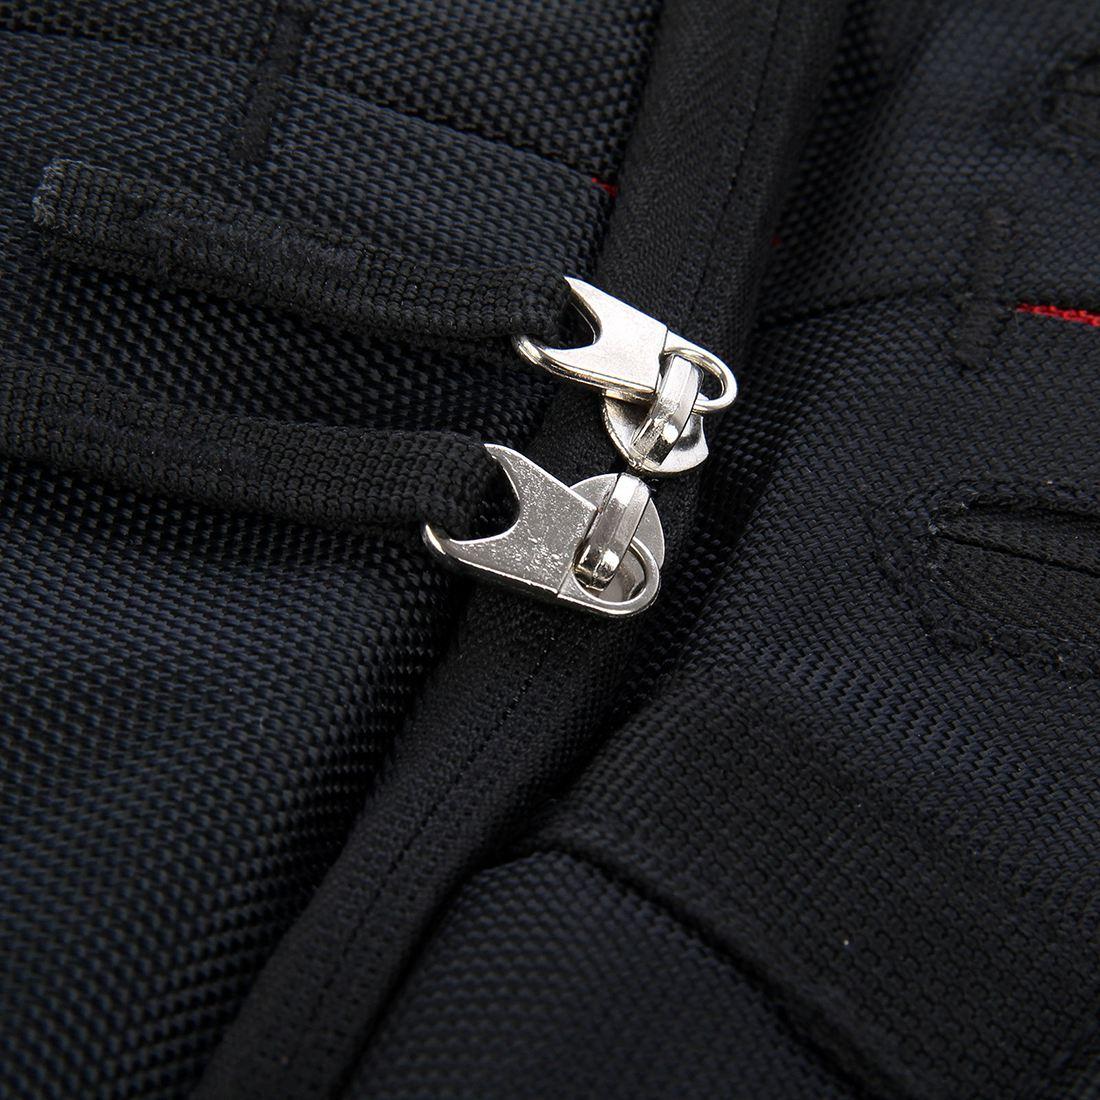 Impermeável digital dslr foto acolchoado câmera mochila